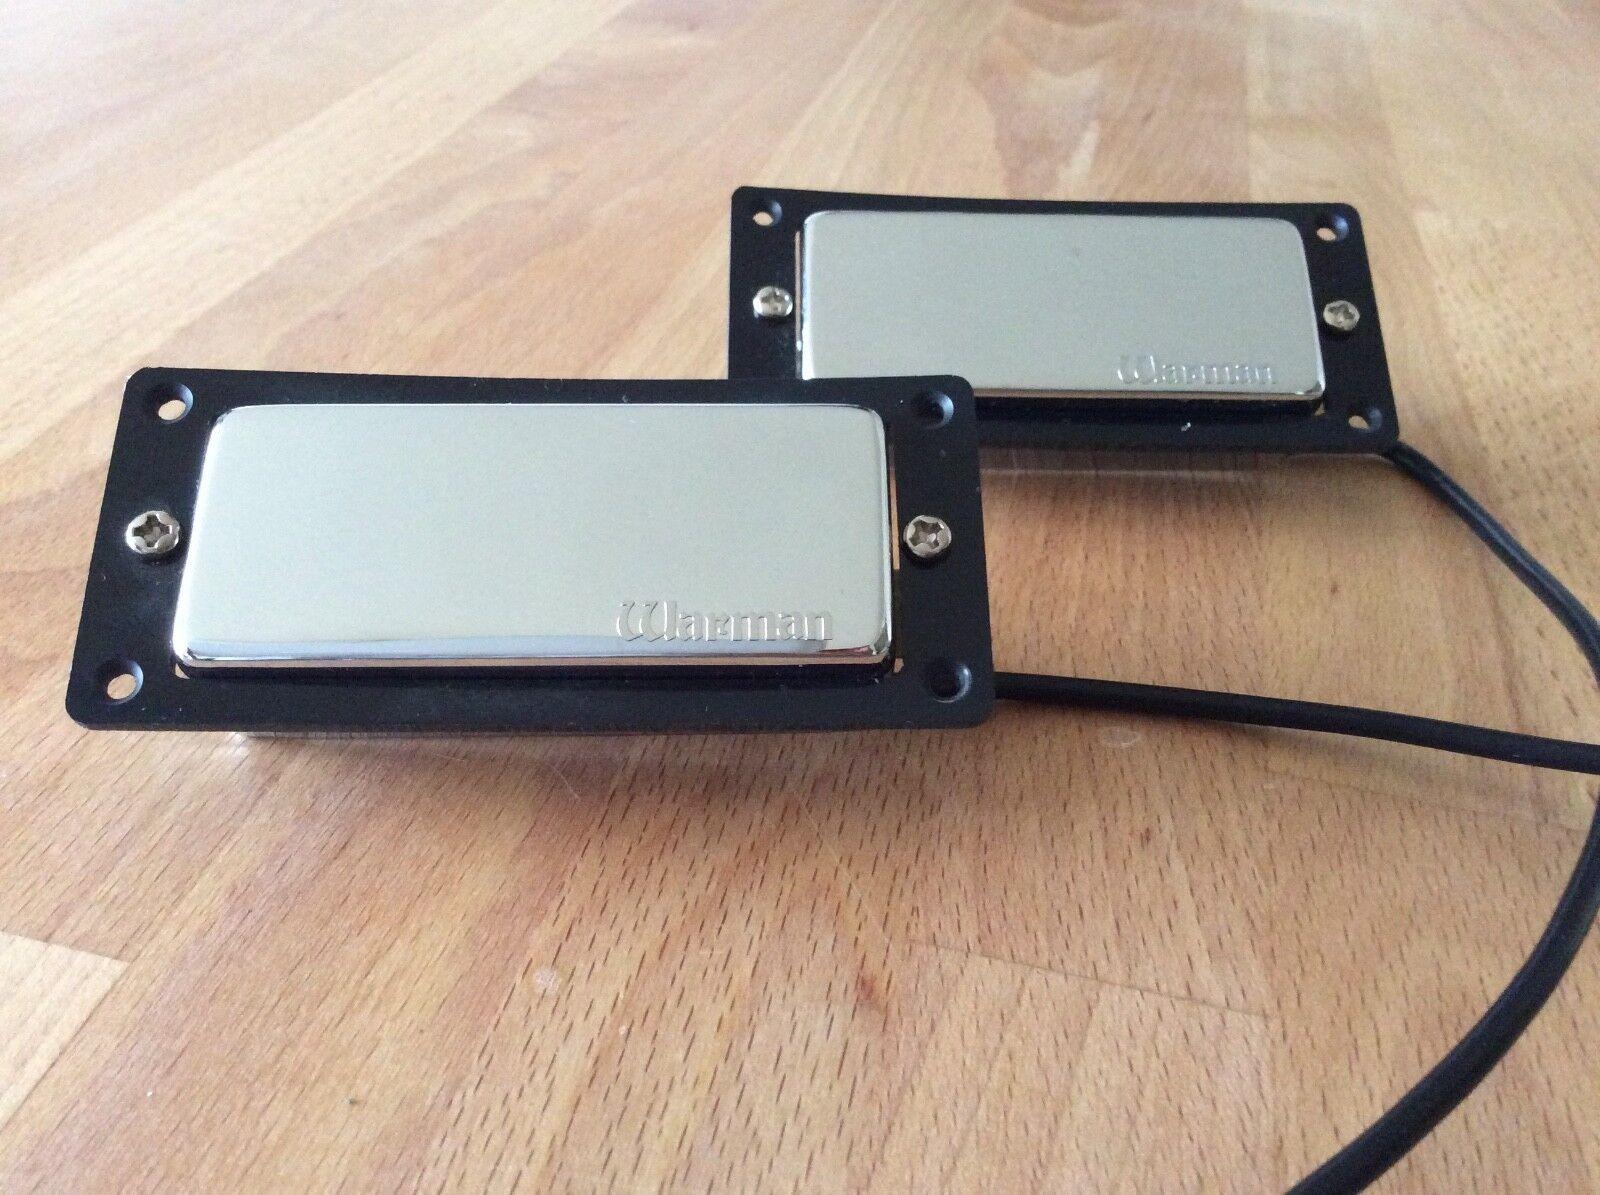 Warman FireBucker - Pair of Poleless Chrome Mini Humbuckers on